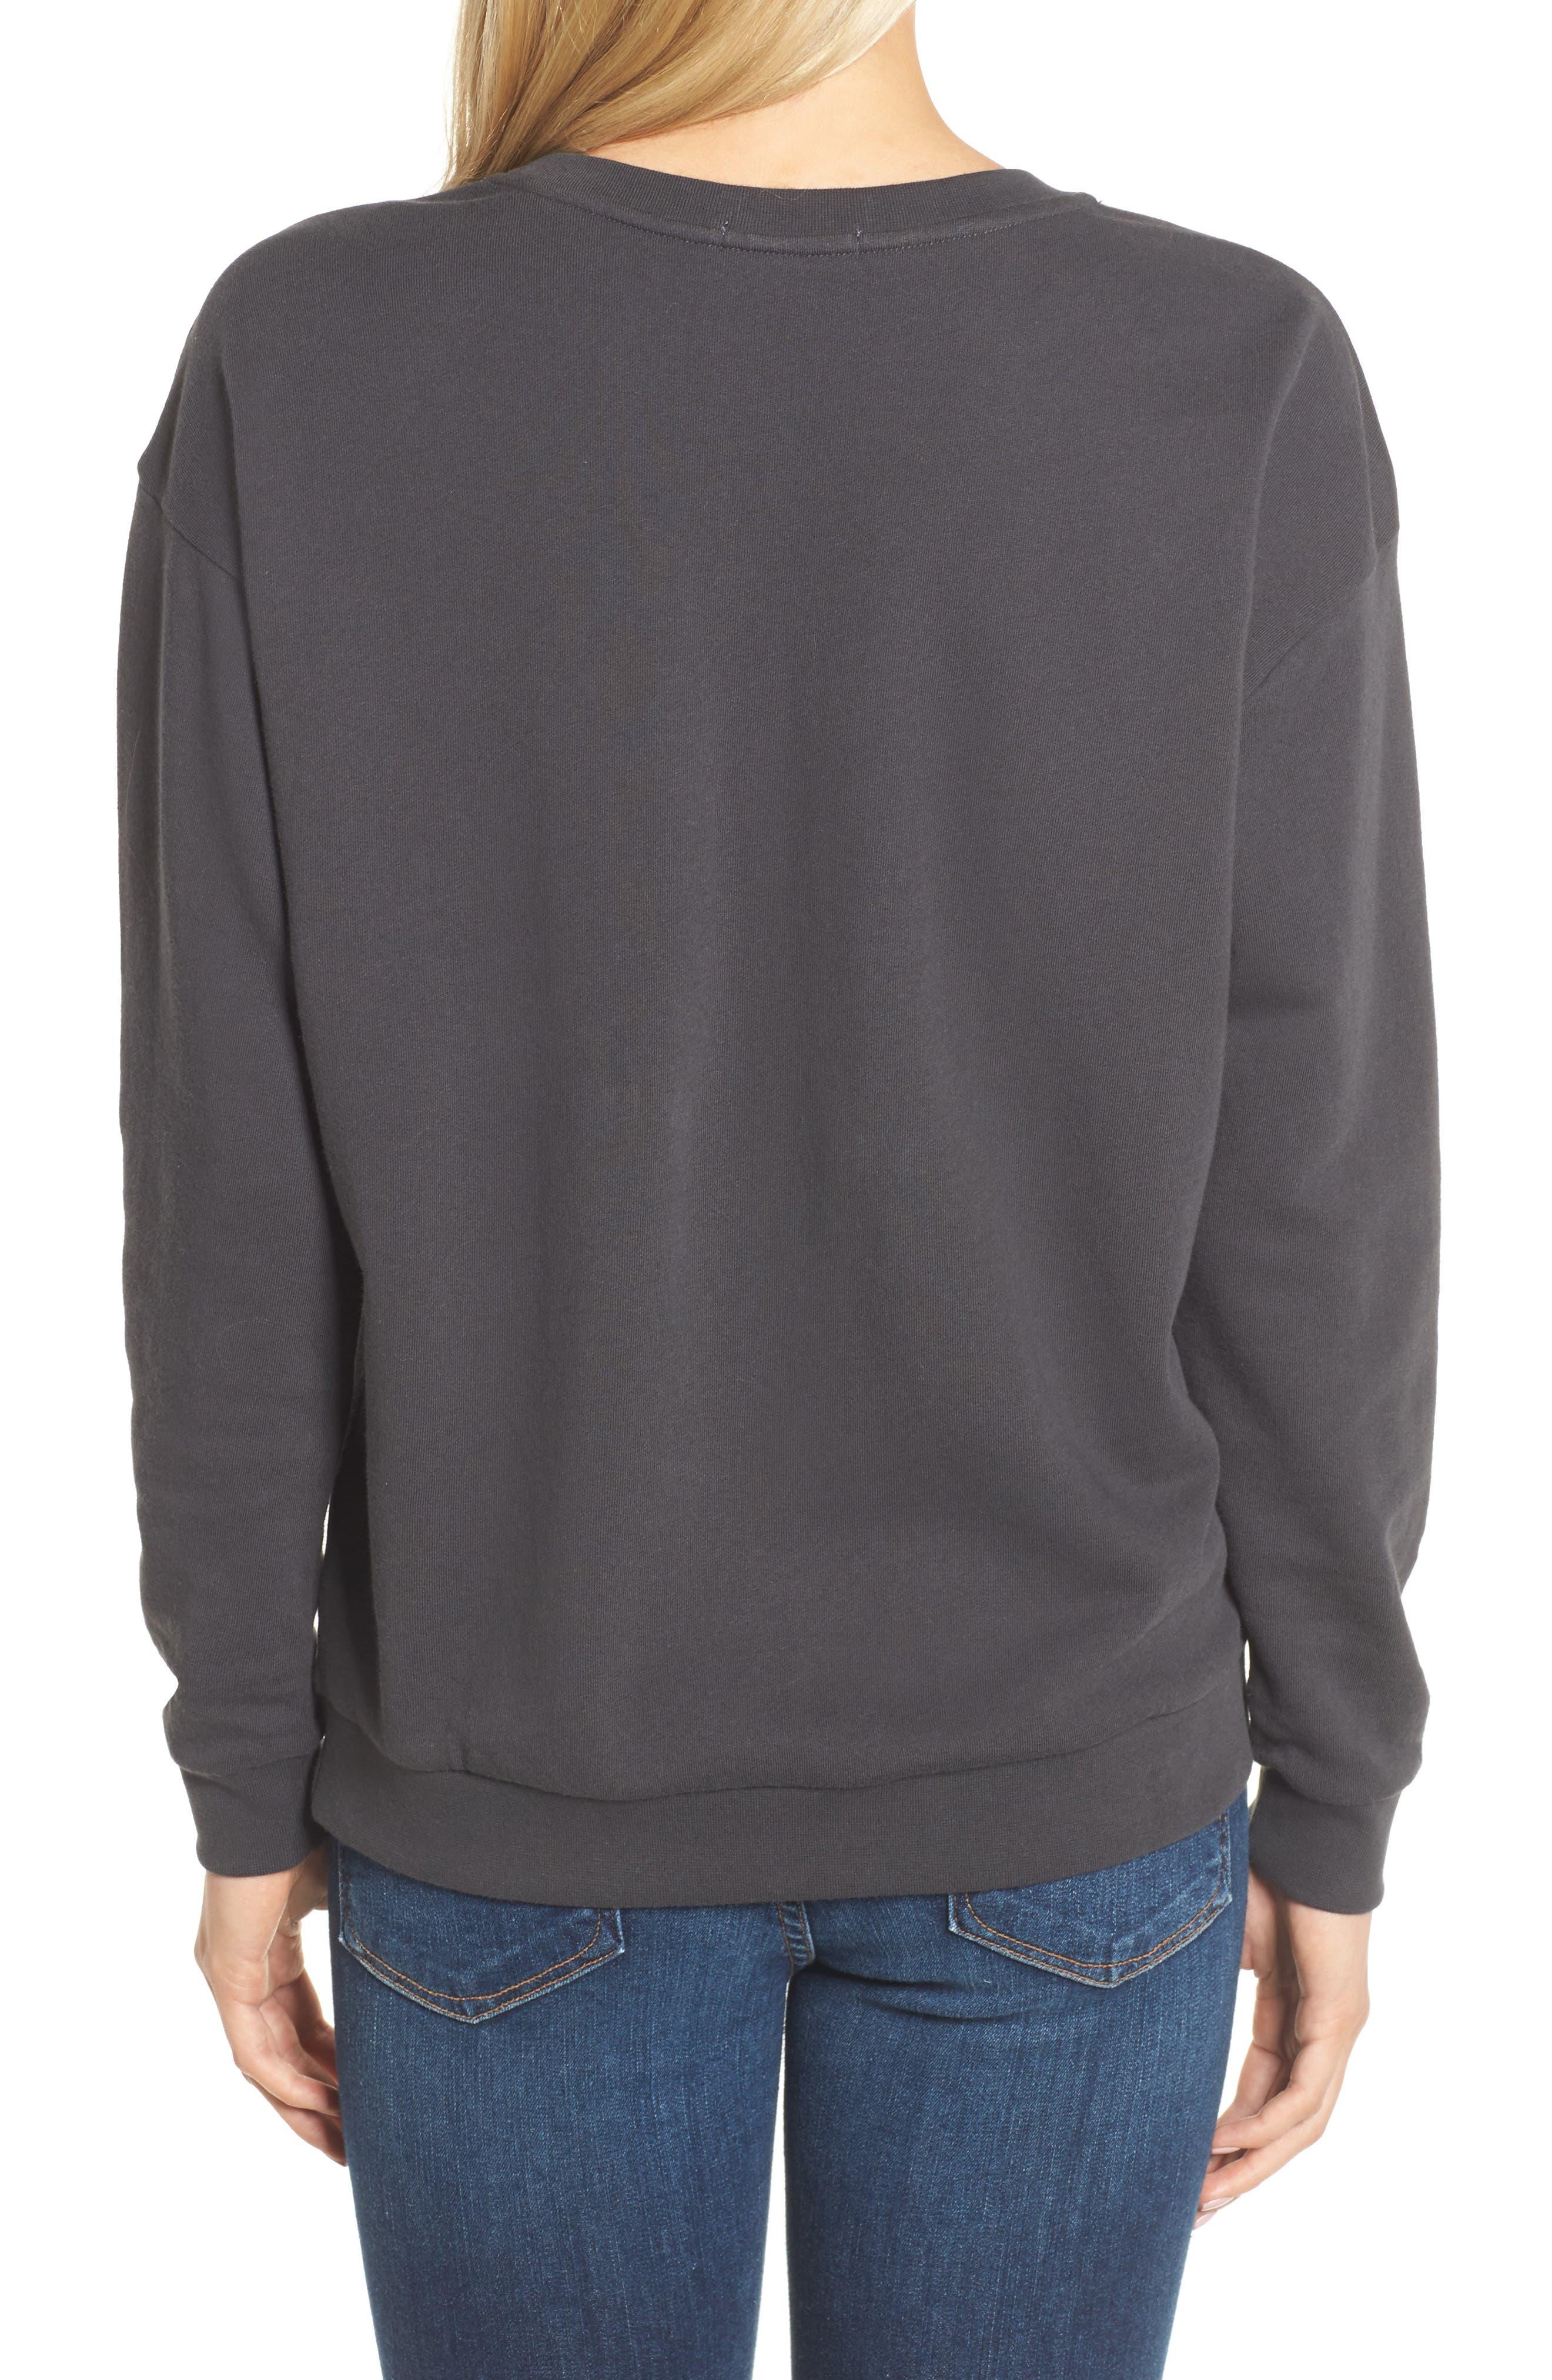 Feeling Bubbly Sweatshirt,                             Alternate thumbnail 2, color,                             Black